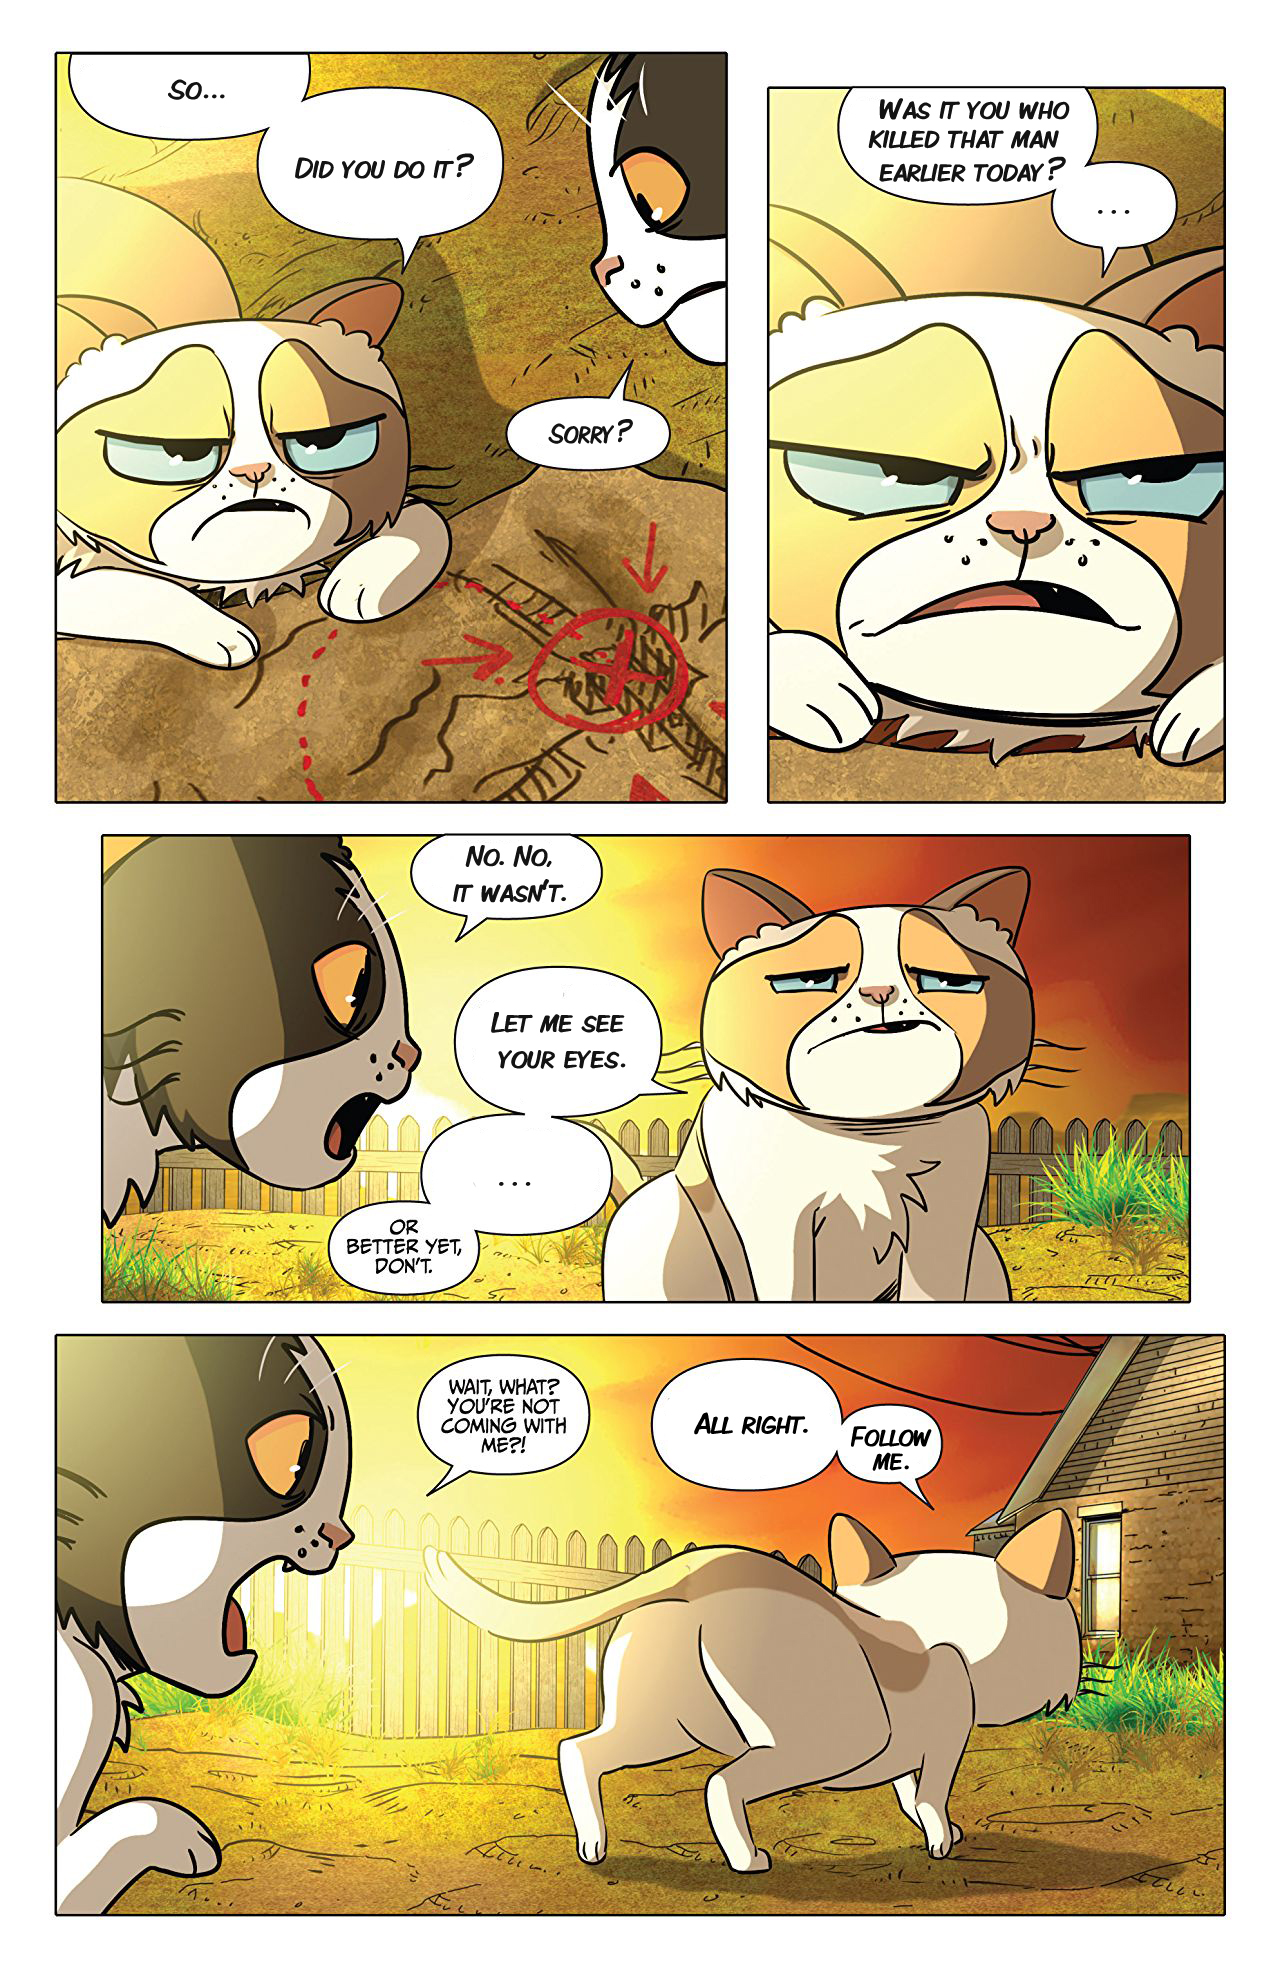 00 Grumpy Cat